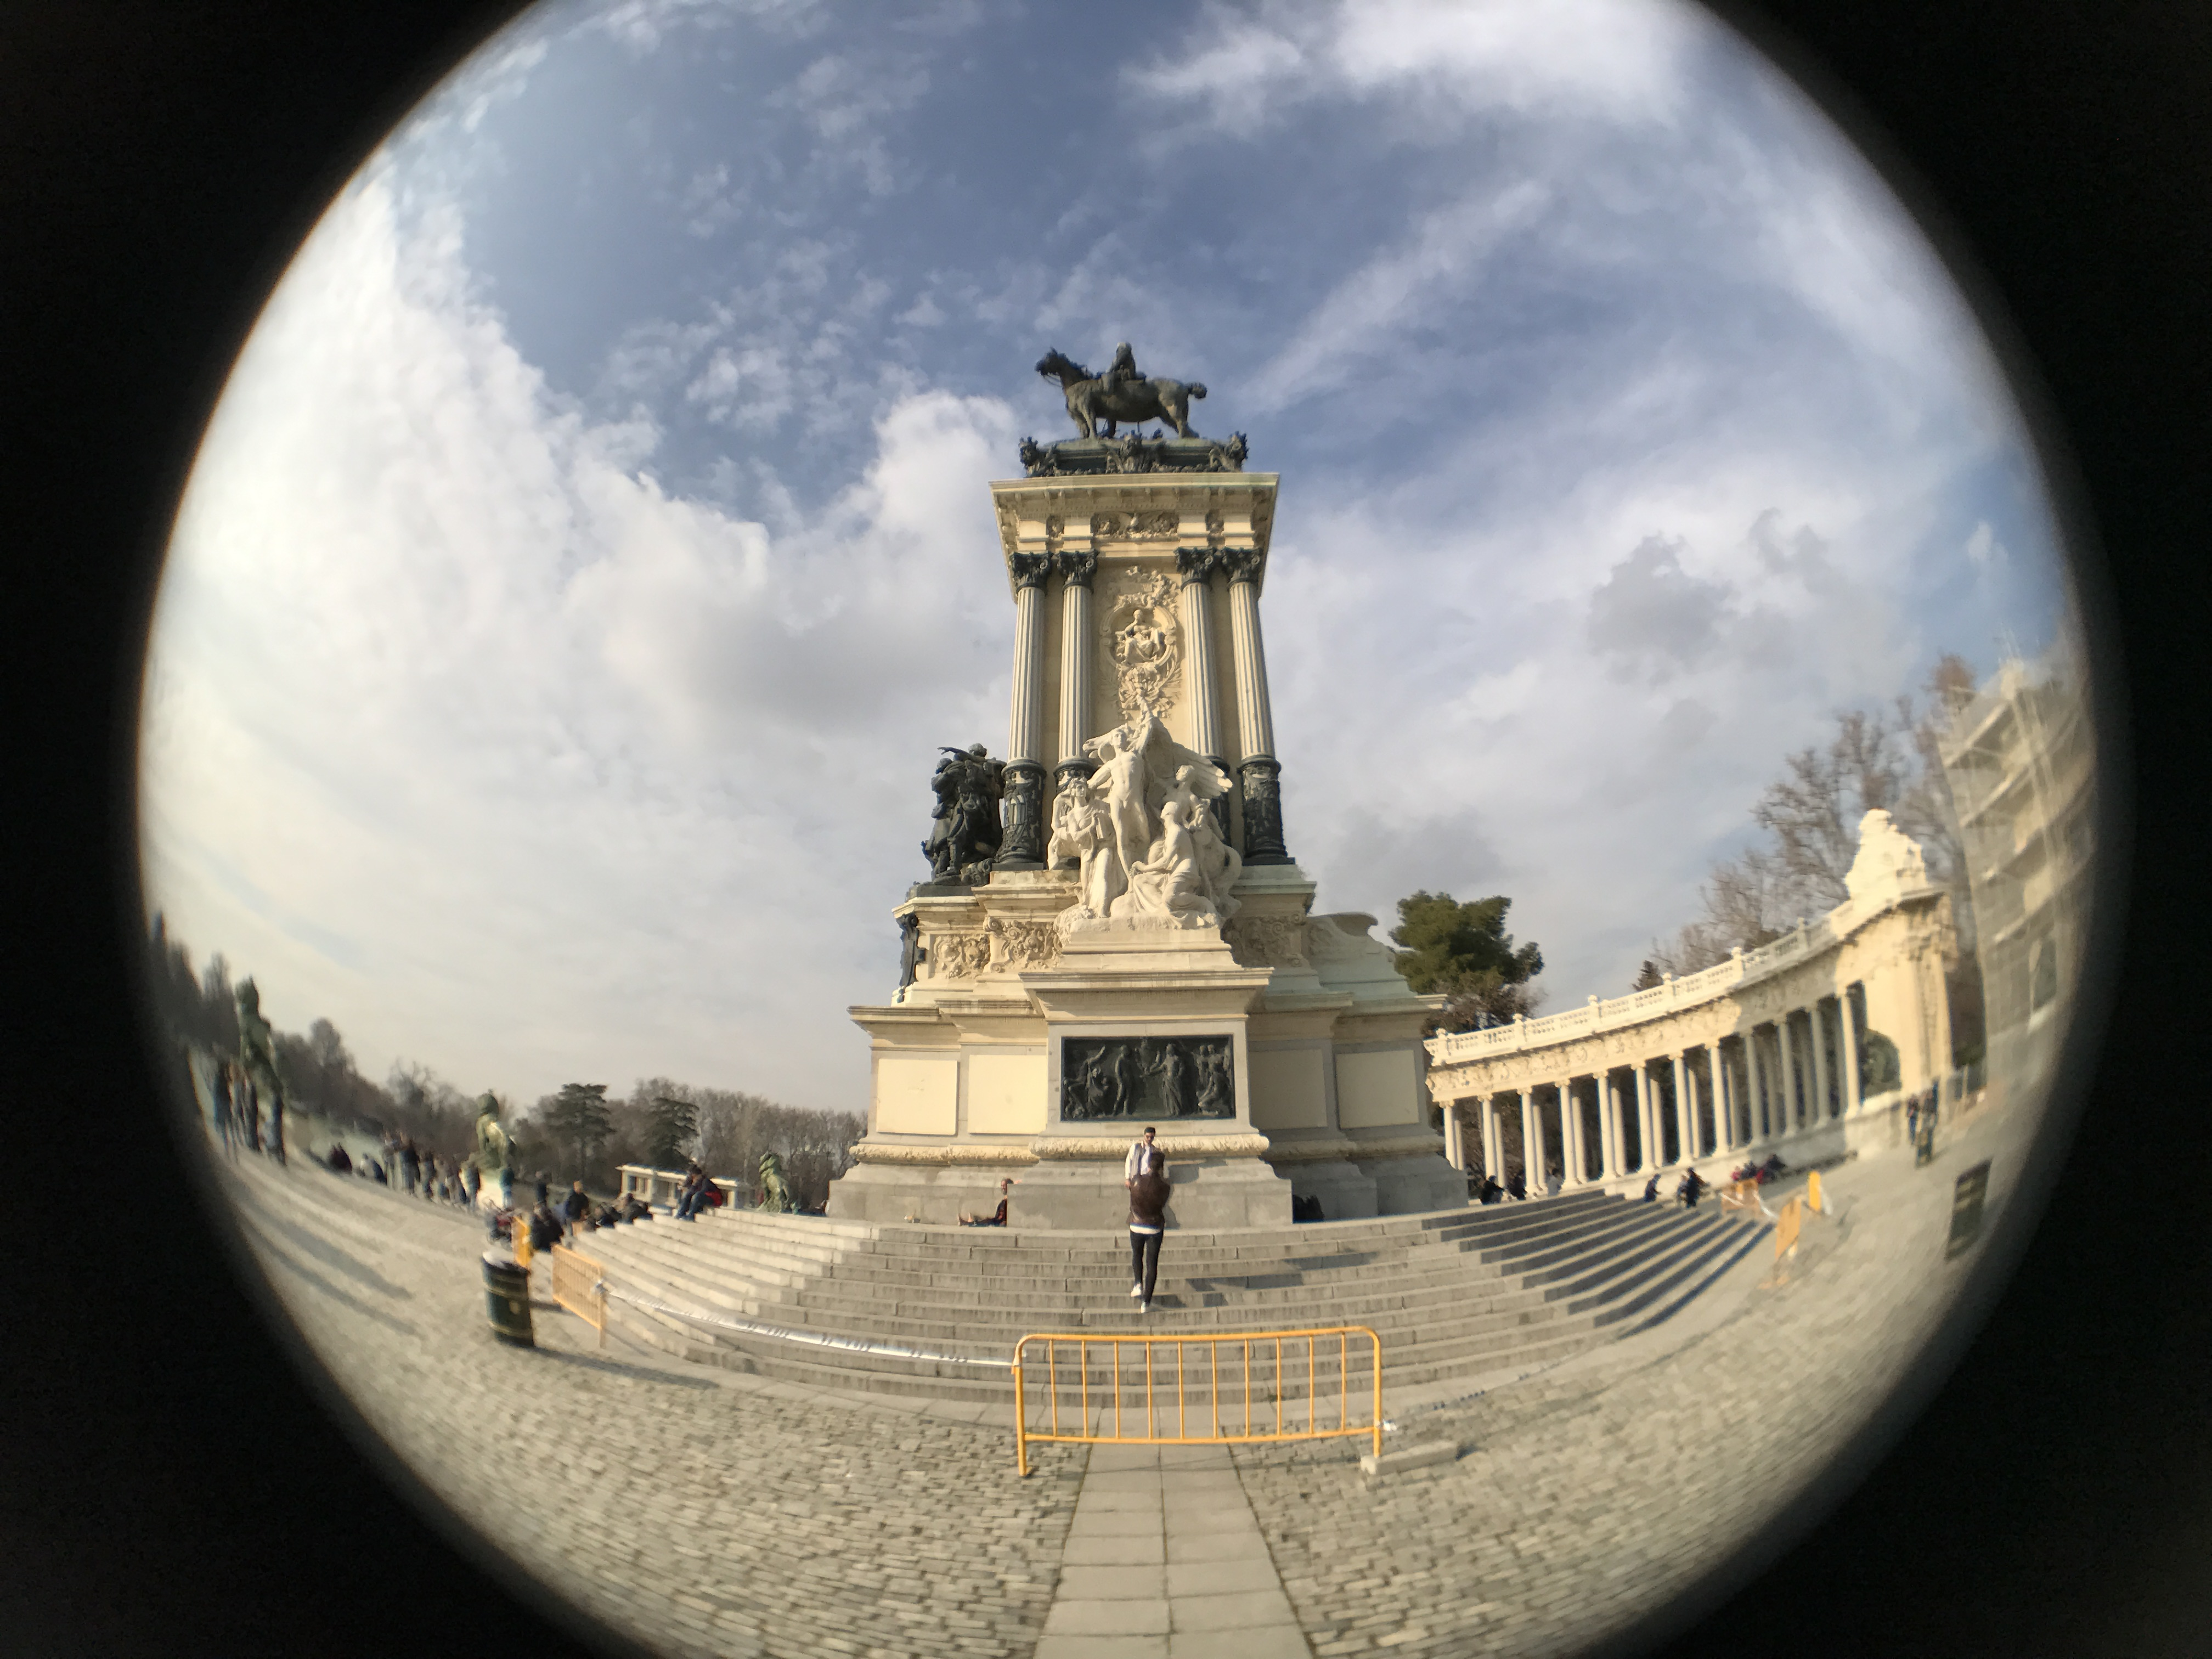 online retailer 2fd43 b0993 Kamerar Lens Zoom Kit for iPhone 7 Plus review: Digital Photography ...